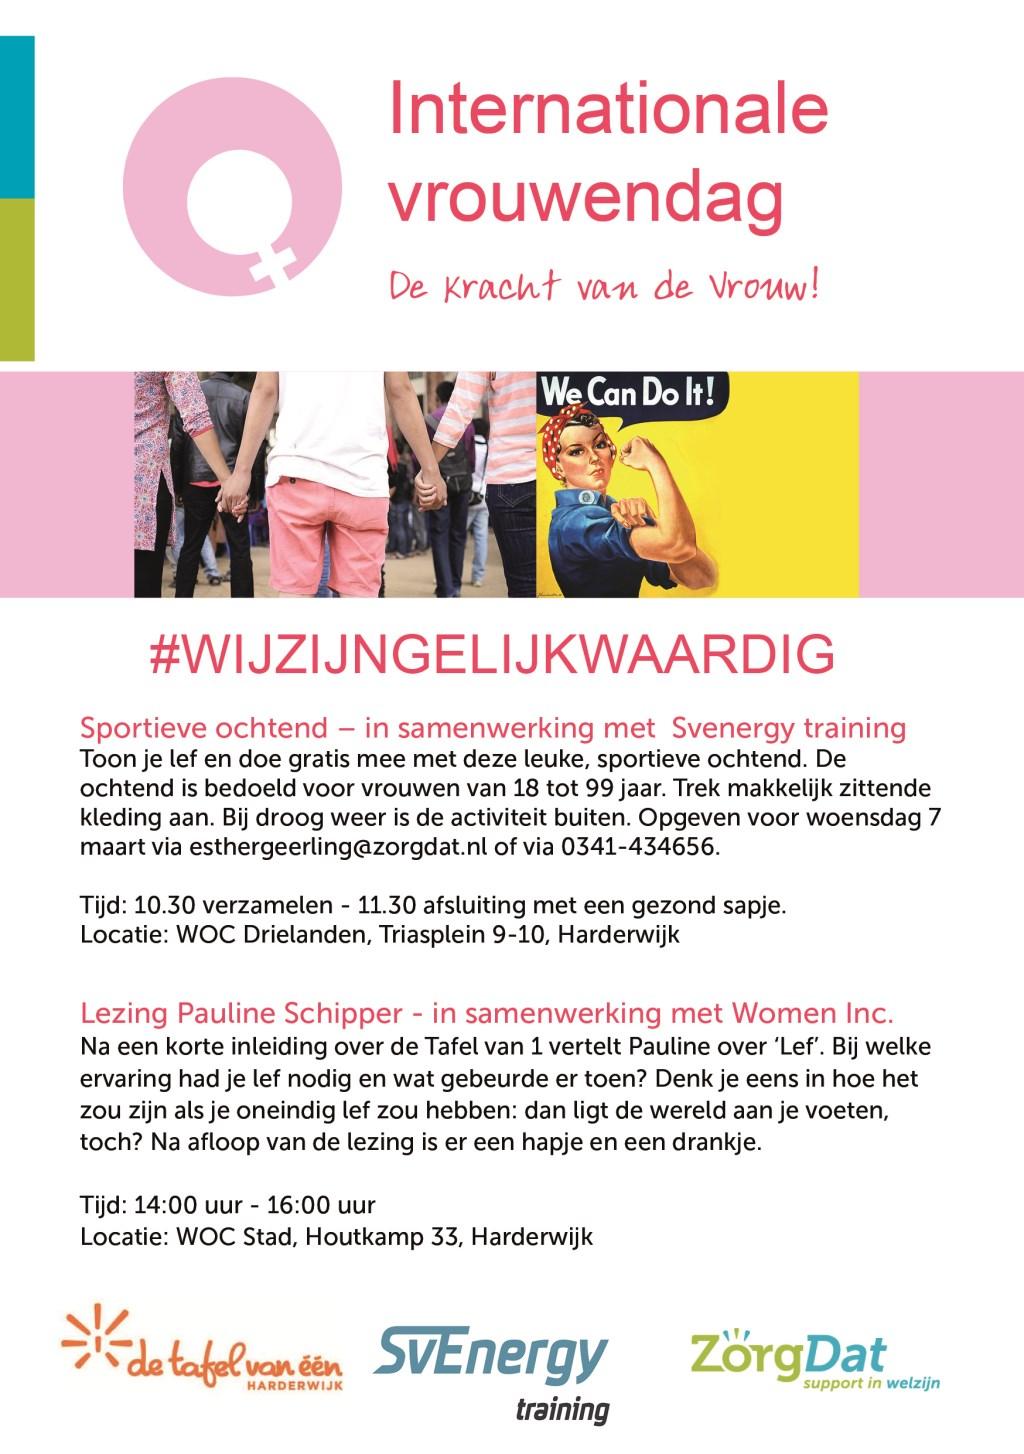 Programma Internationale Vrouwendag Harderwijk